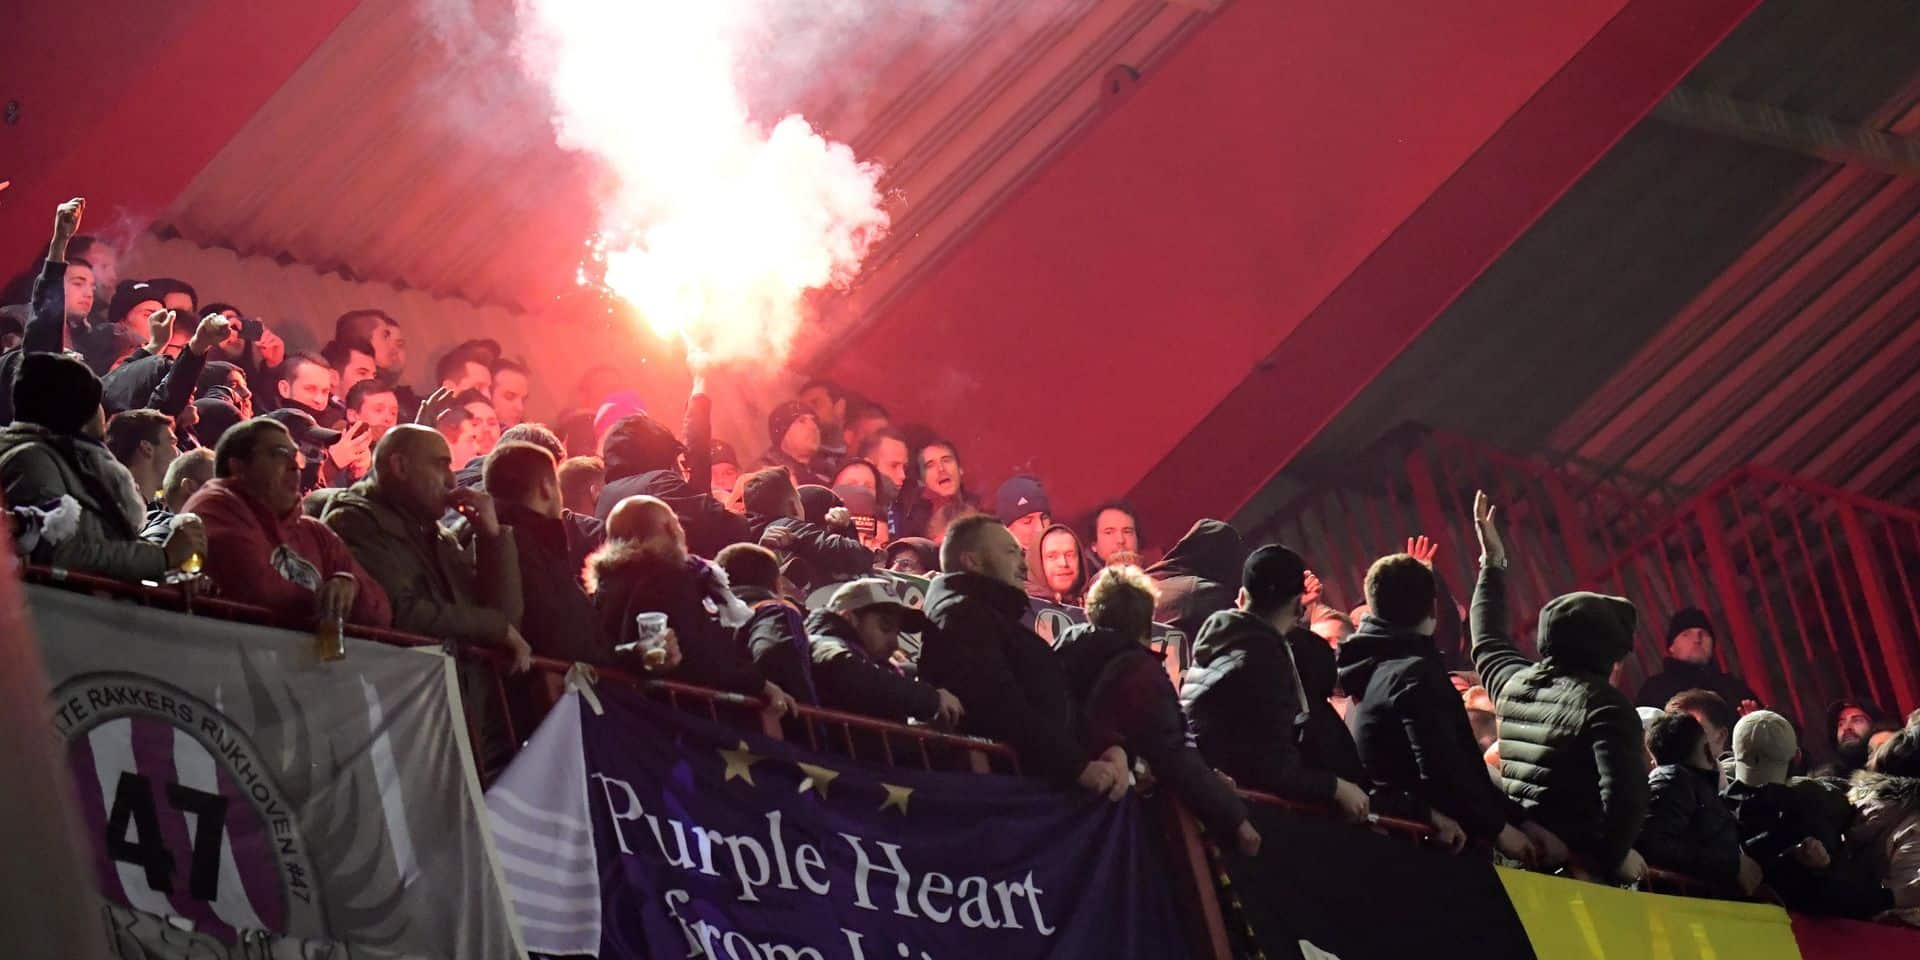 LIEGE, BELGIUM - APRIL 12 :fans of Anderlecht and illustration picture fireworks the Jupiler Pro League play off 1 match between Standard de Liege and RSC Anderlecht on April 12, 2019 in Liege, Belgium, 12/04/2019 ( Photo by Peter De Voecht Photonews